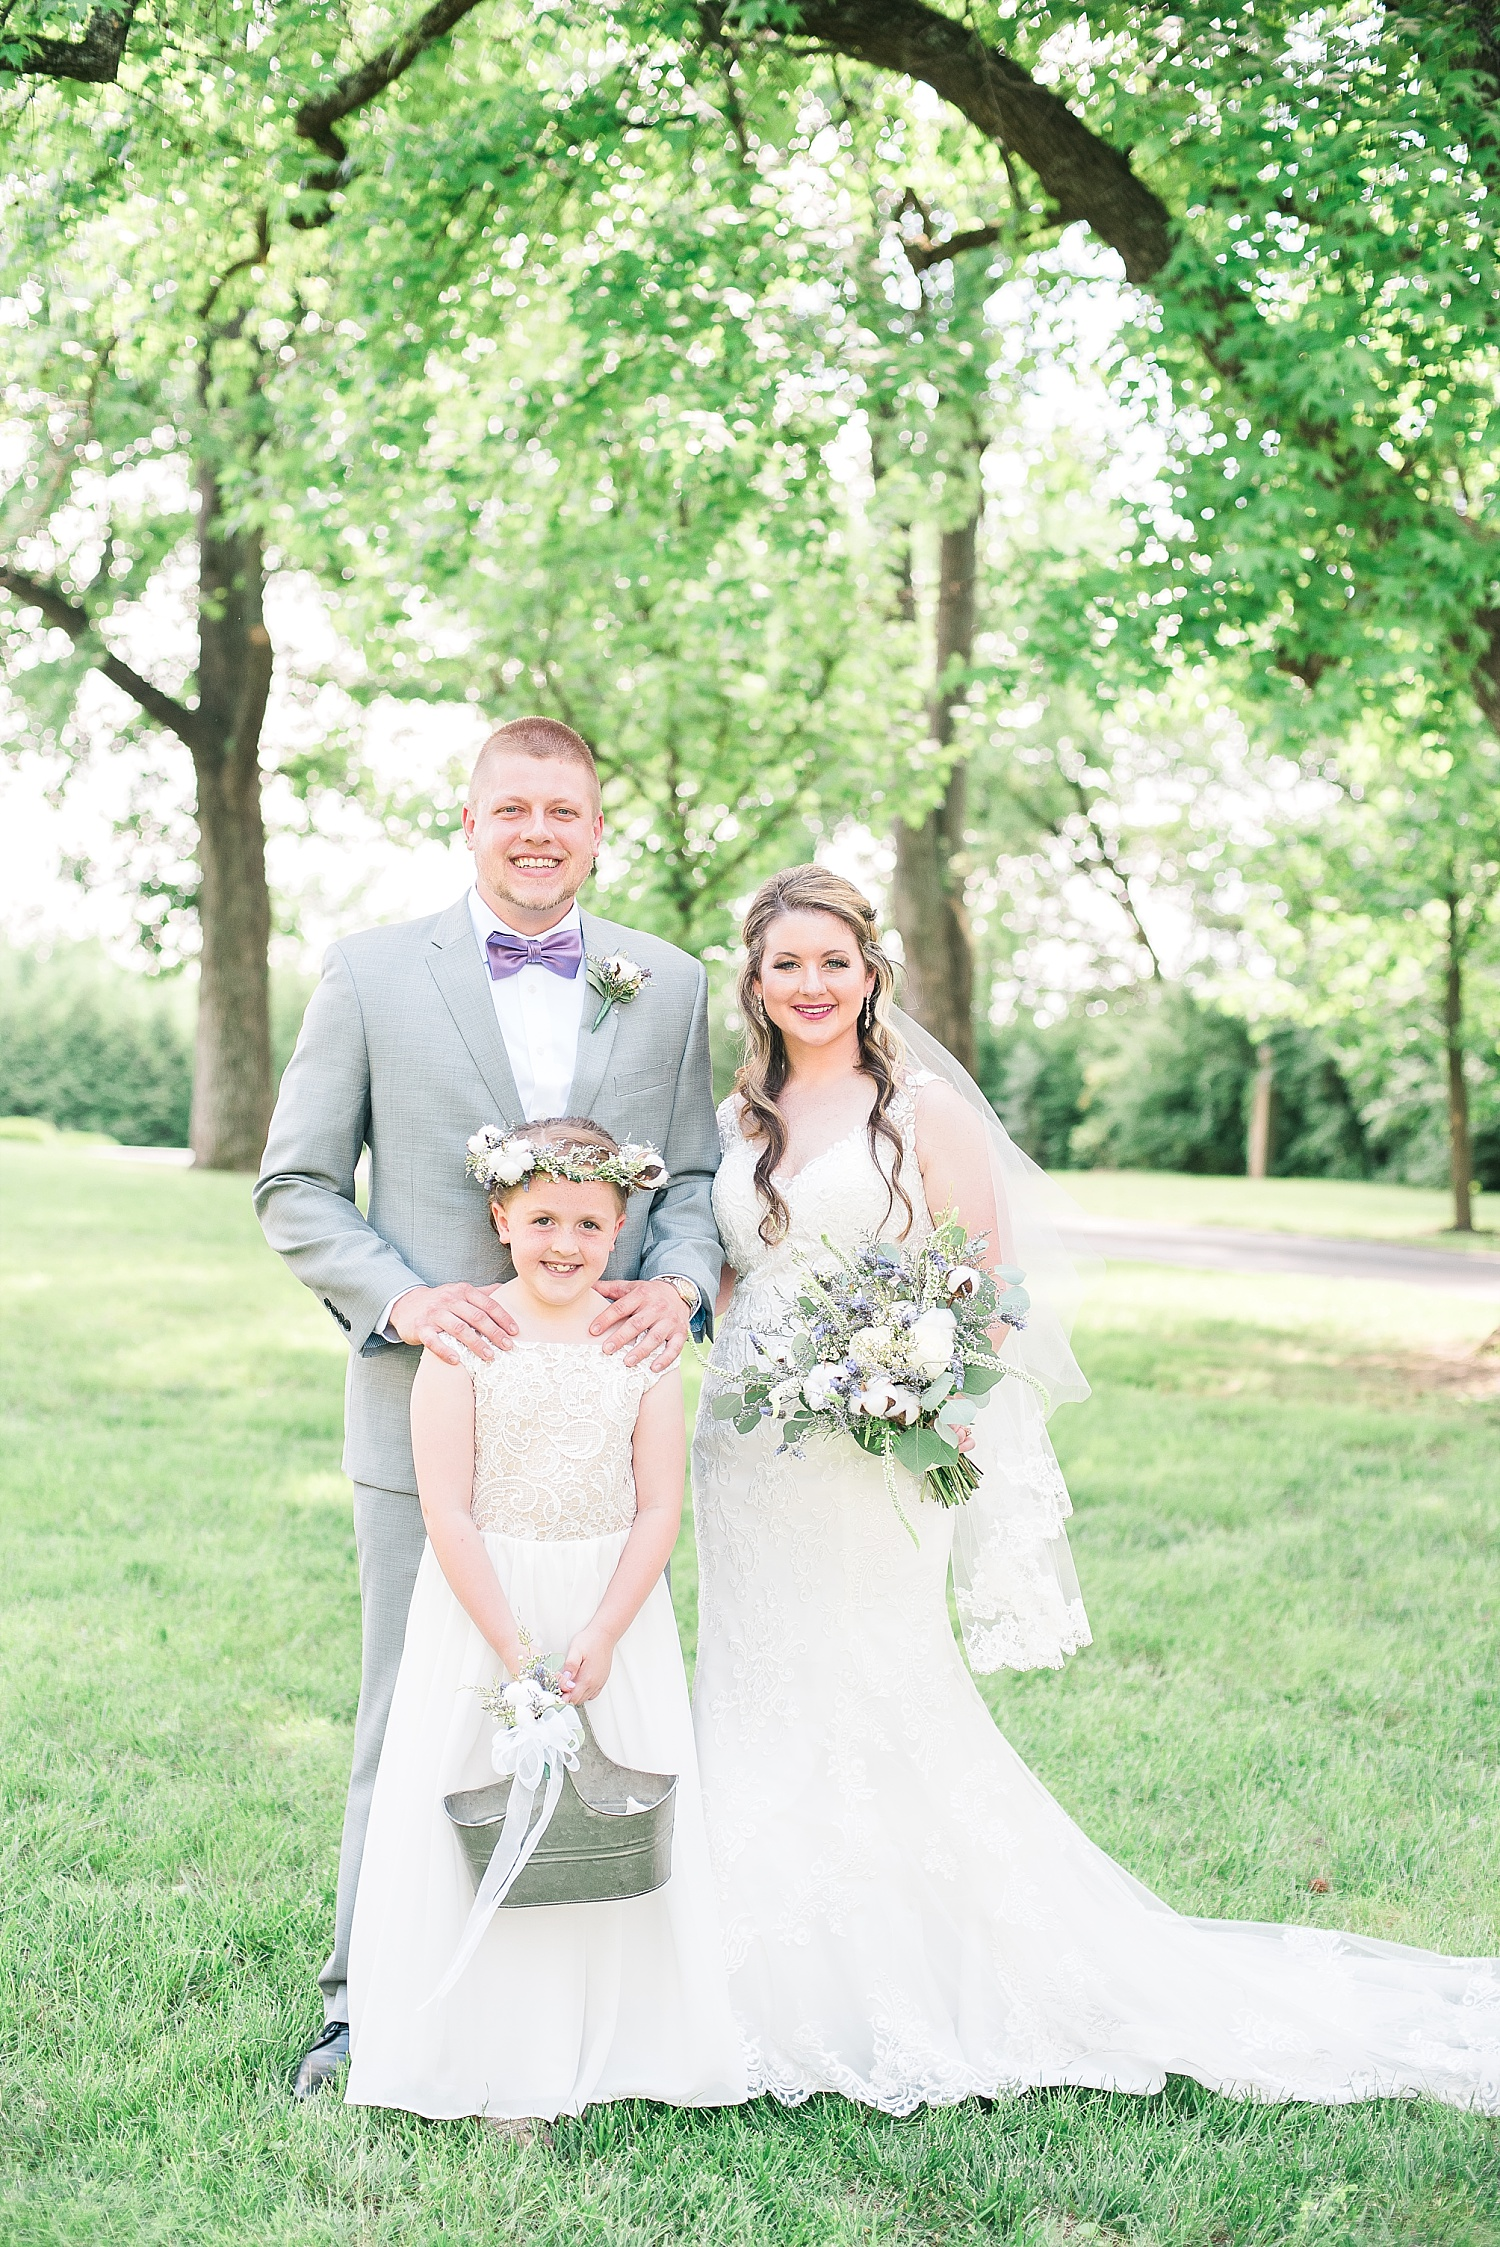 flower-girl-with-bride-groom